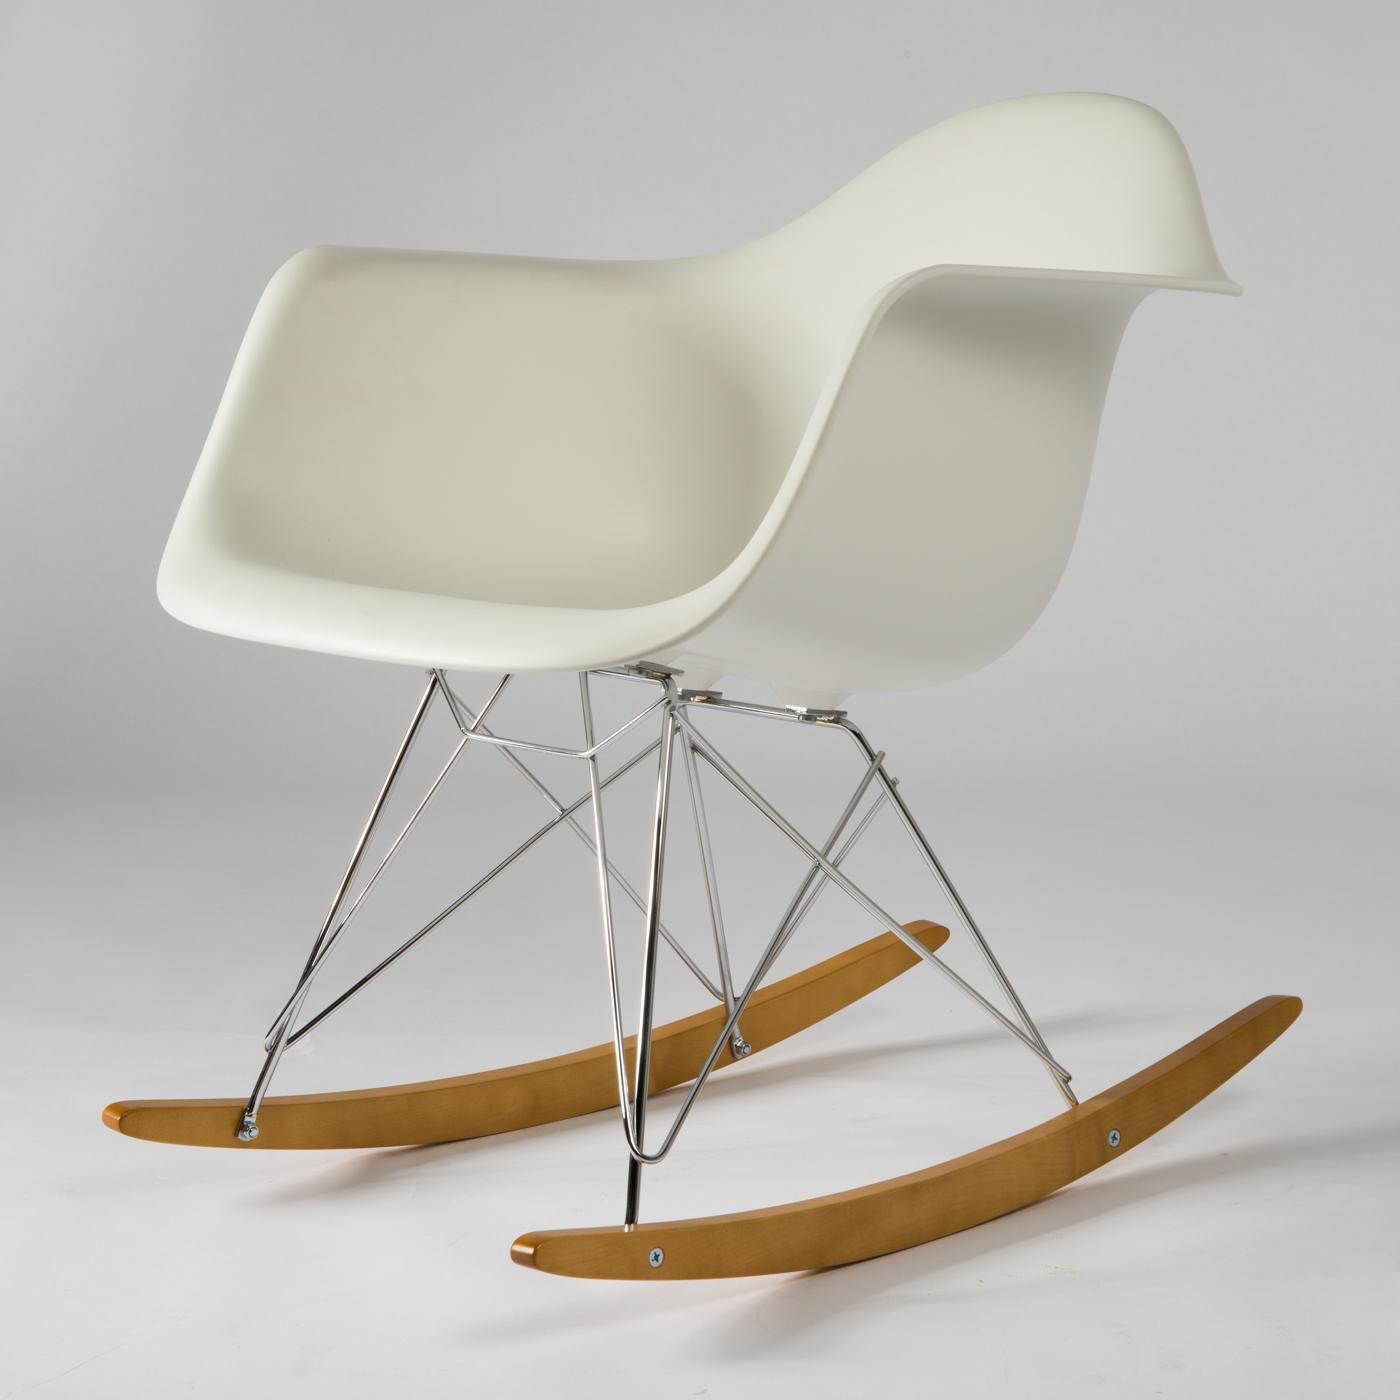 Hochwertig Charles U0026 Ray Eames Für Vitra, Plastic Armchair RAR Schaukelstuhl /  Arhmlehnstuhl / Stuhl, Entwurf 1950, Kunststoff EPC Und Chrom | Lauritz.com